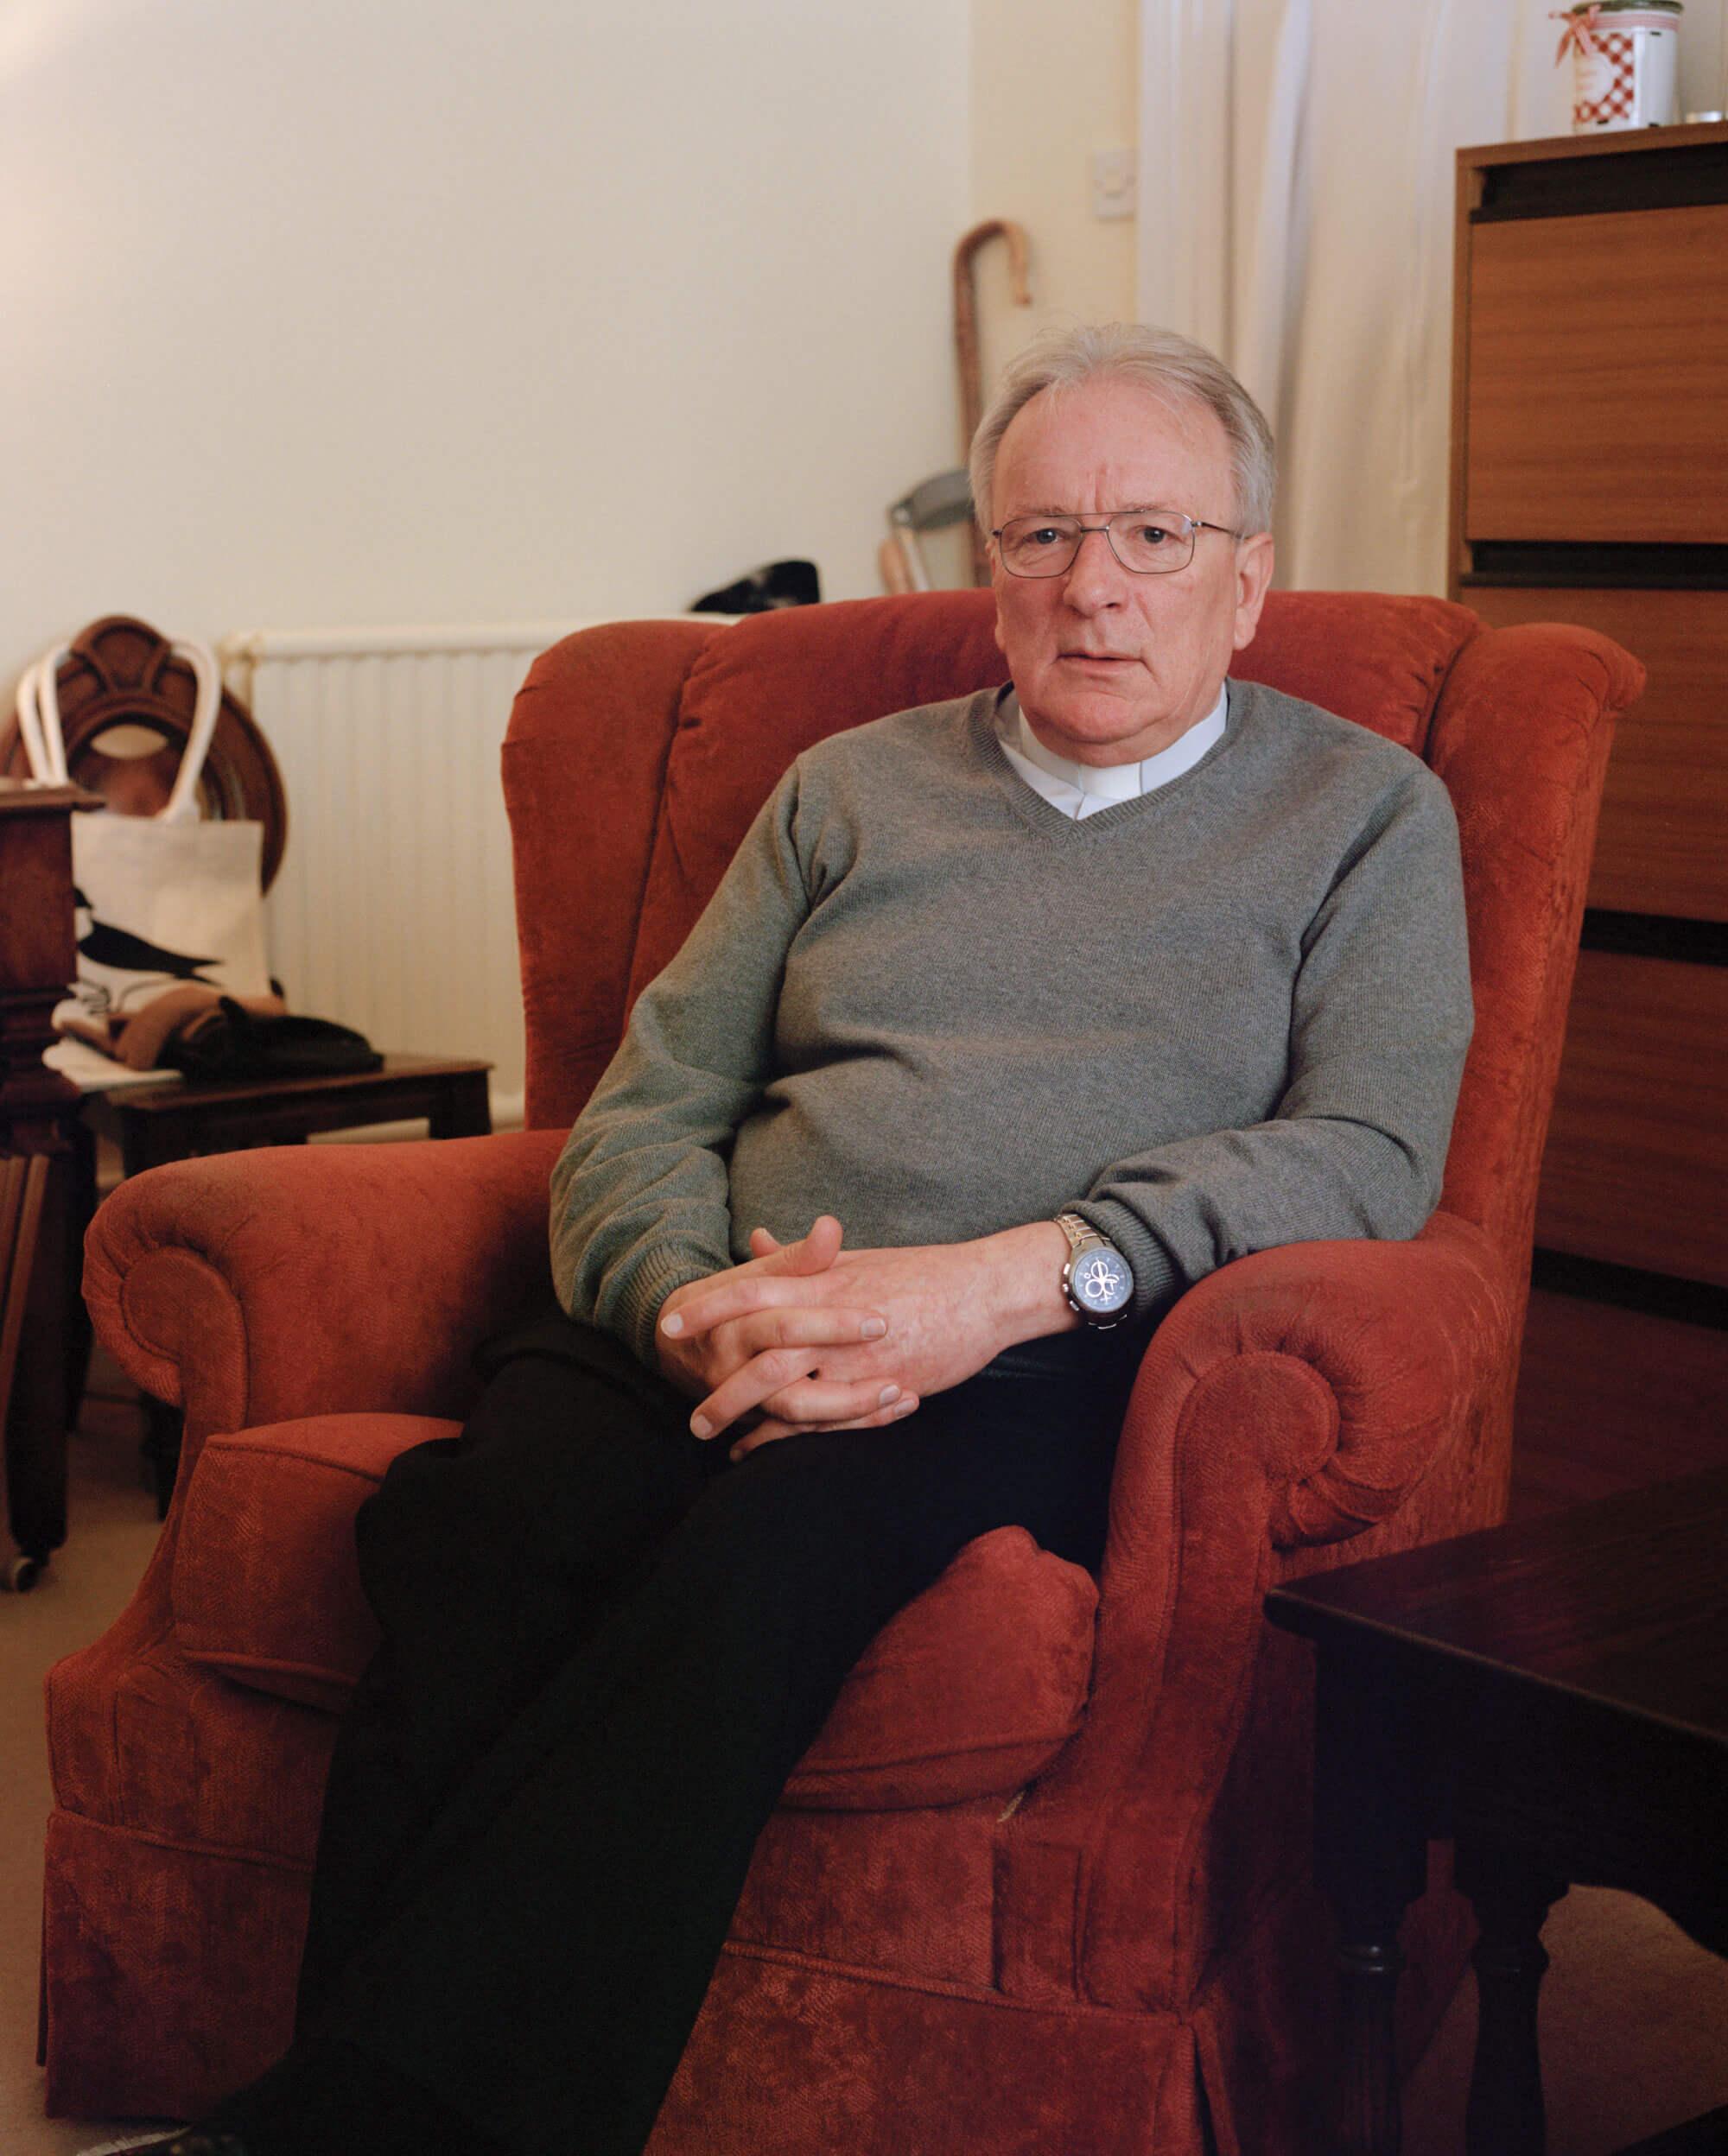 man sat in red chair against white wall in a Catholic Church by matt Scott